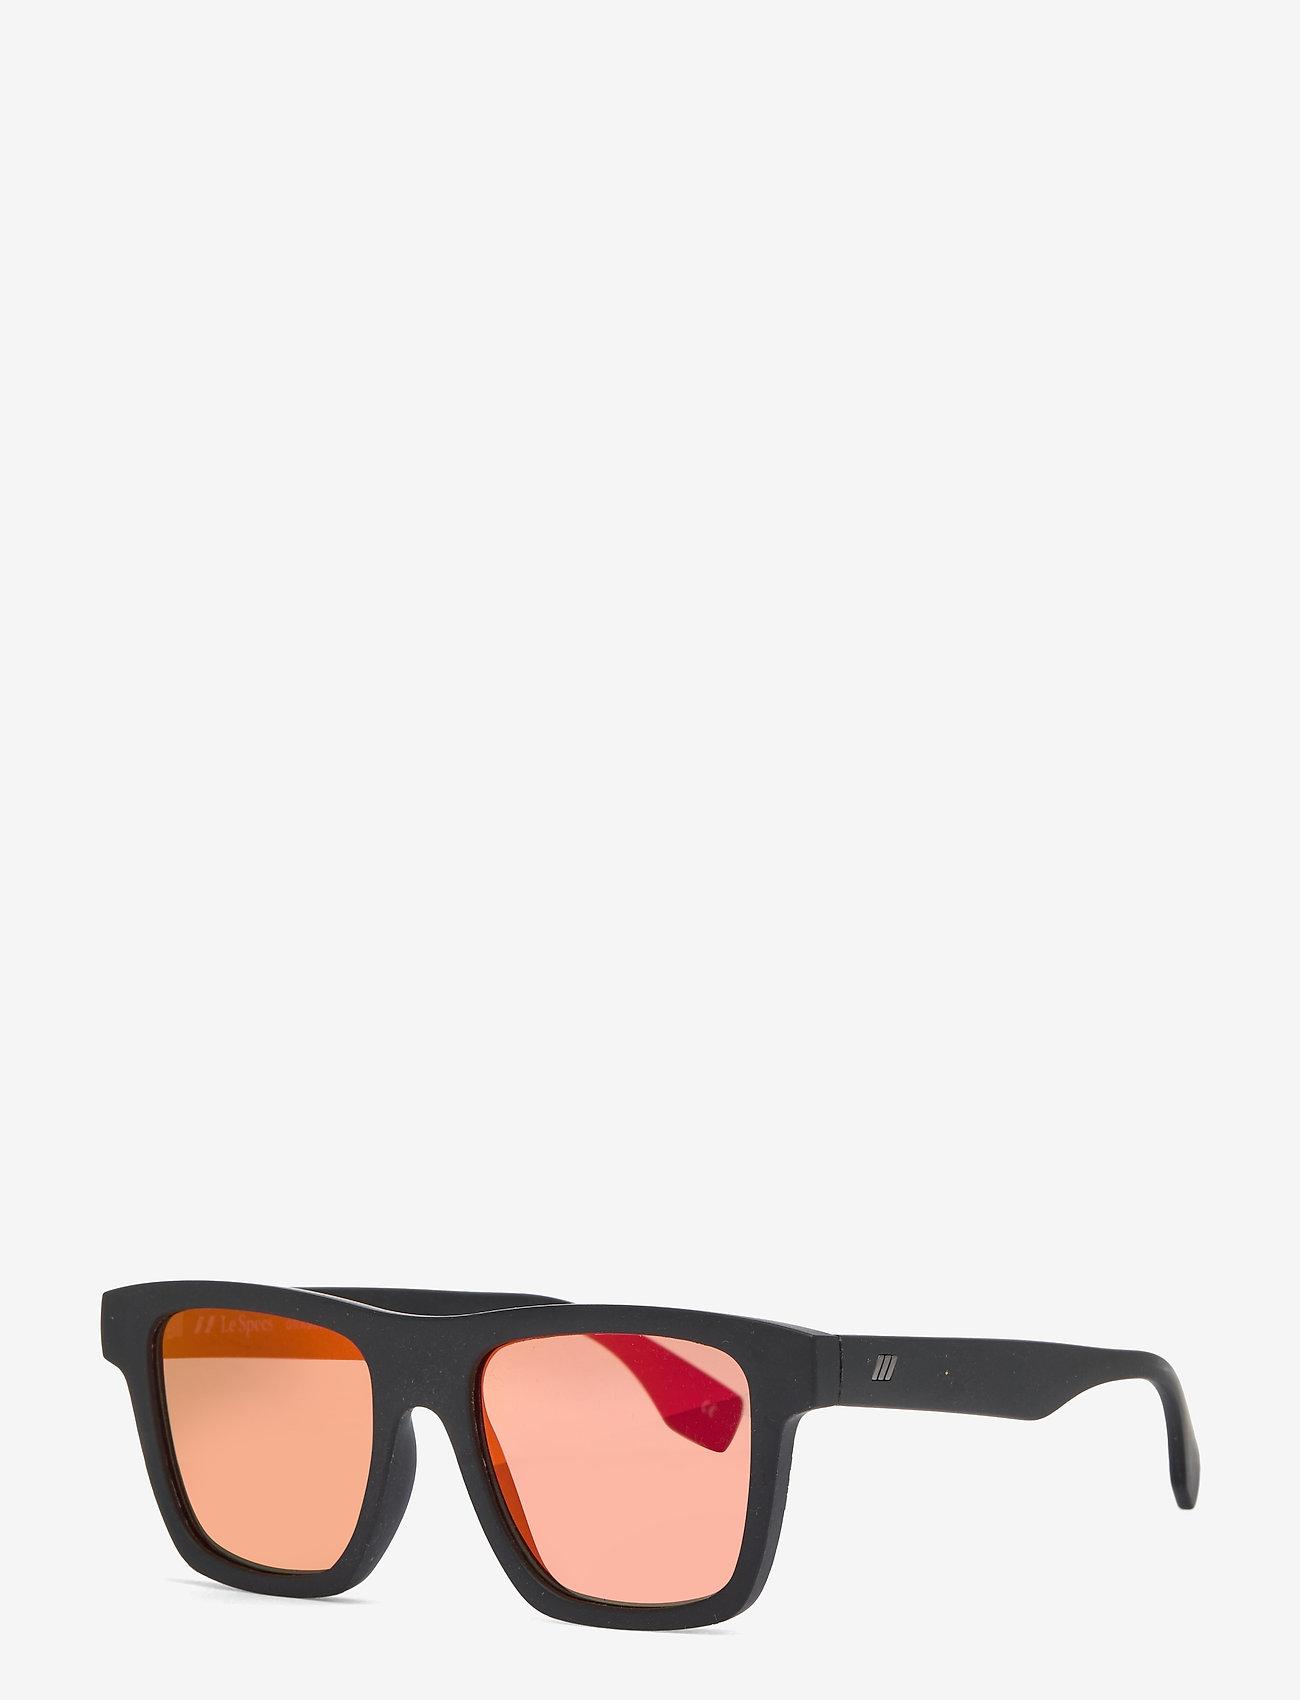 Le Specs - LE SUSTAIN - GRASSY KNOLL - d-vormige - black grass w/ red mirror - 1